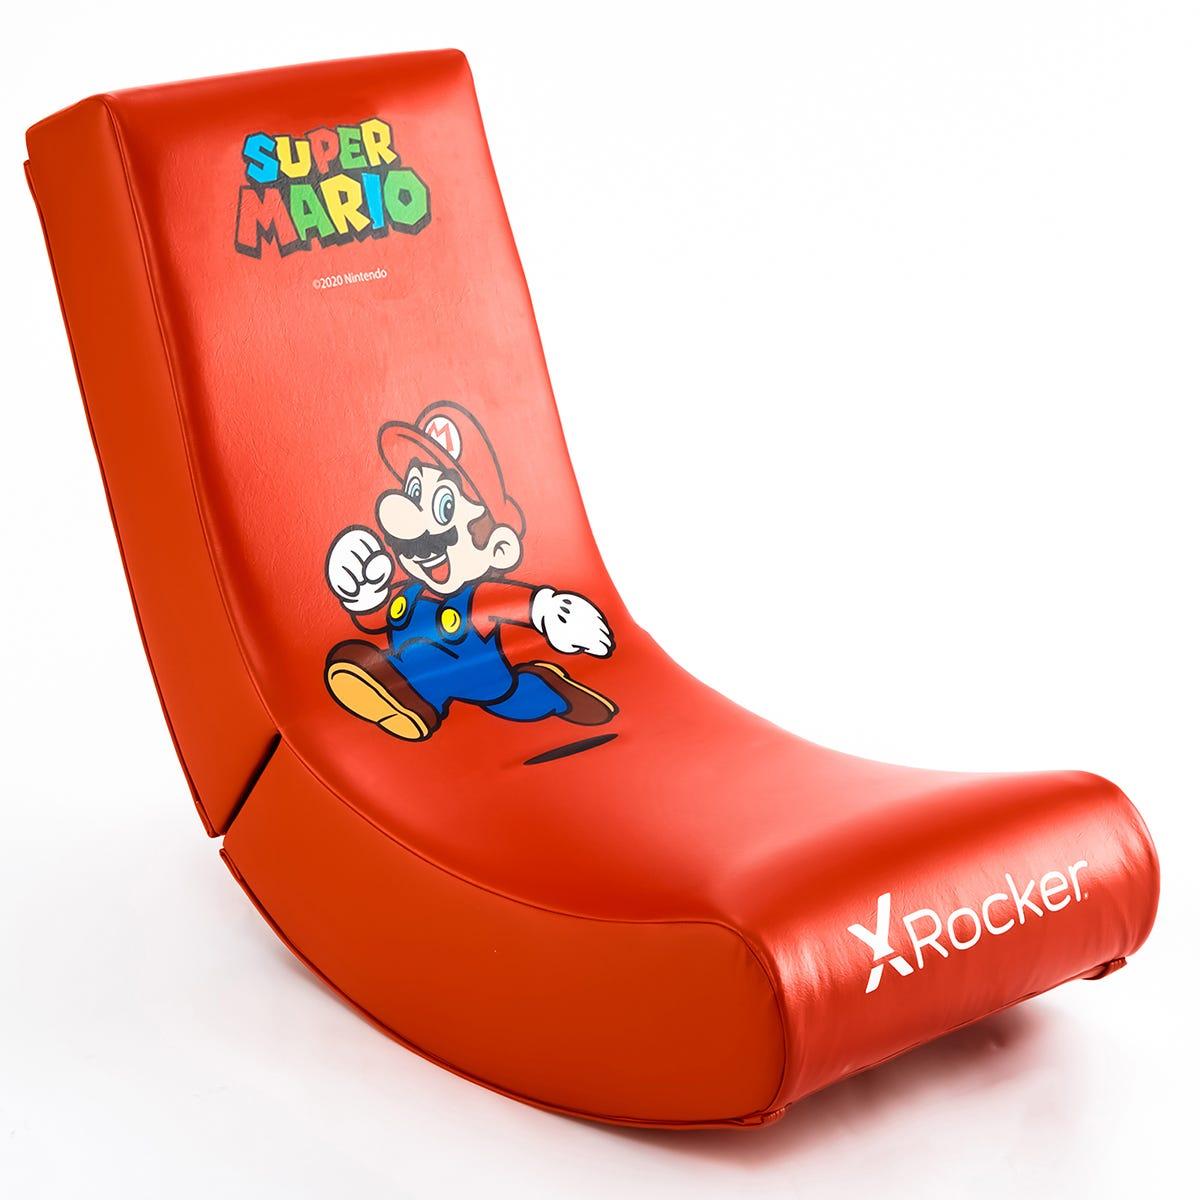 X Rocker X-Rocker Nintendo Video Rocker Foldable Gaming Chair - Official Super Mario Bros - Mario Jump